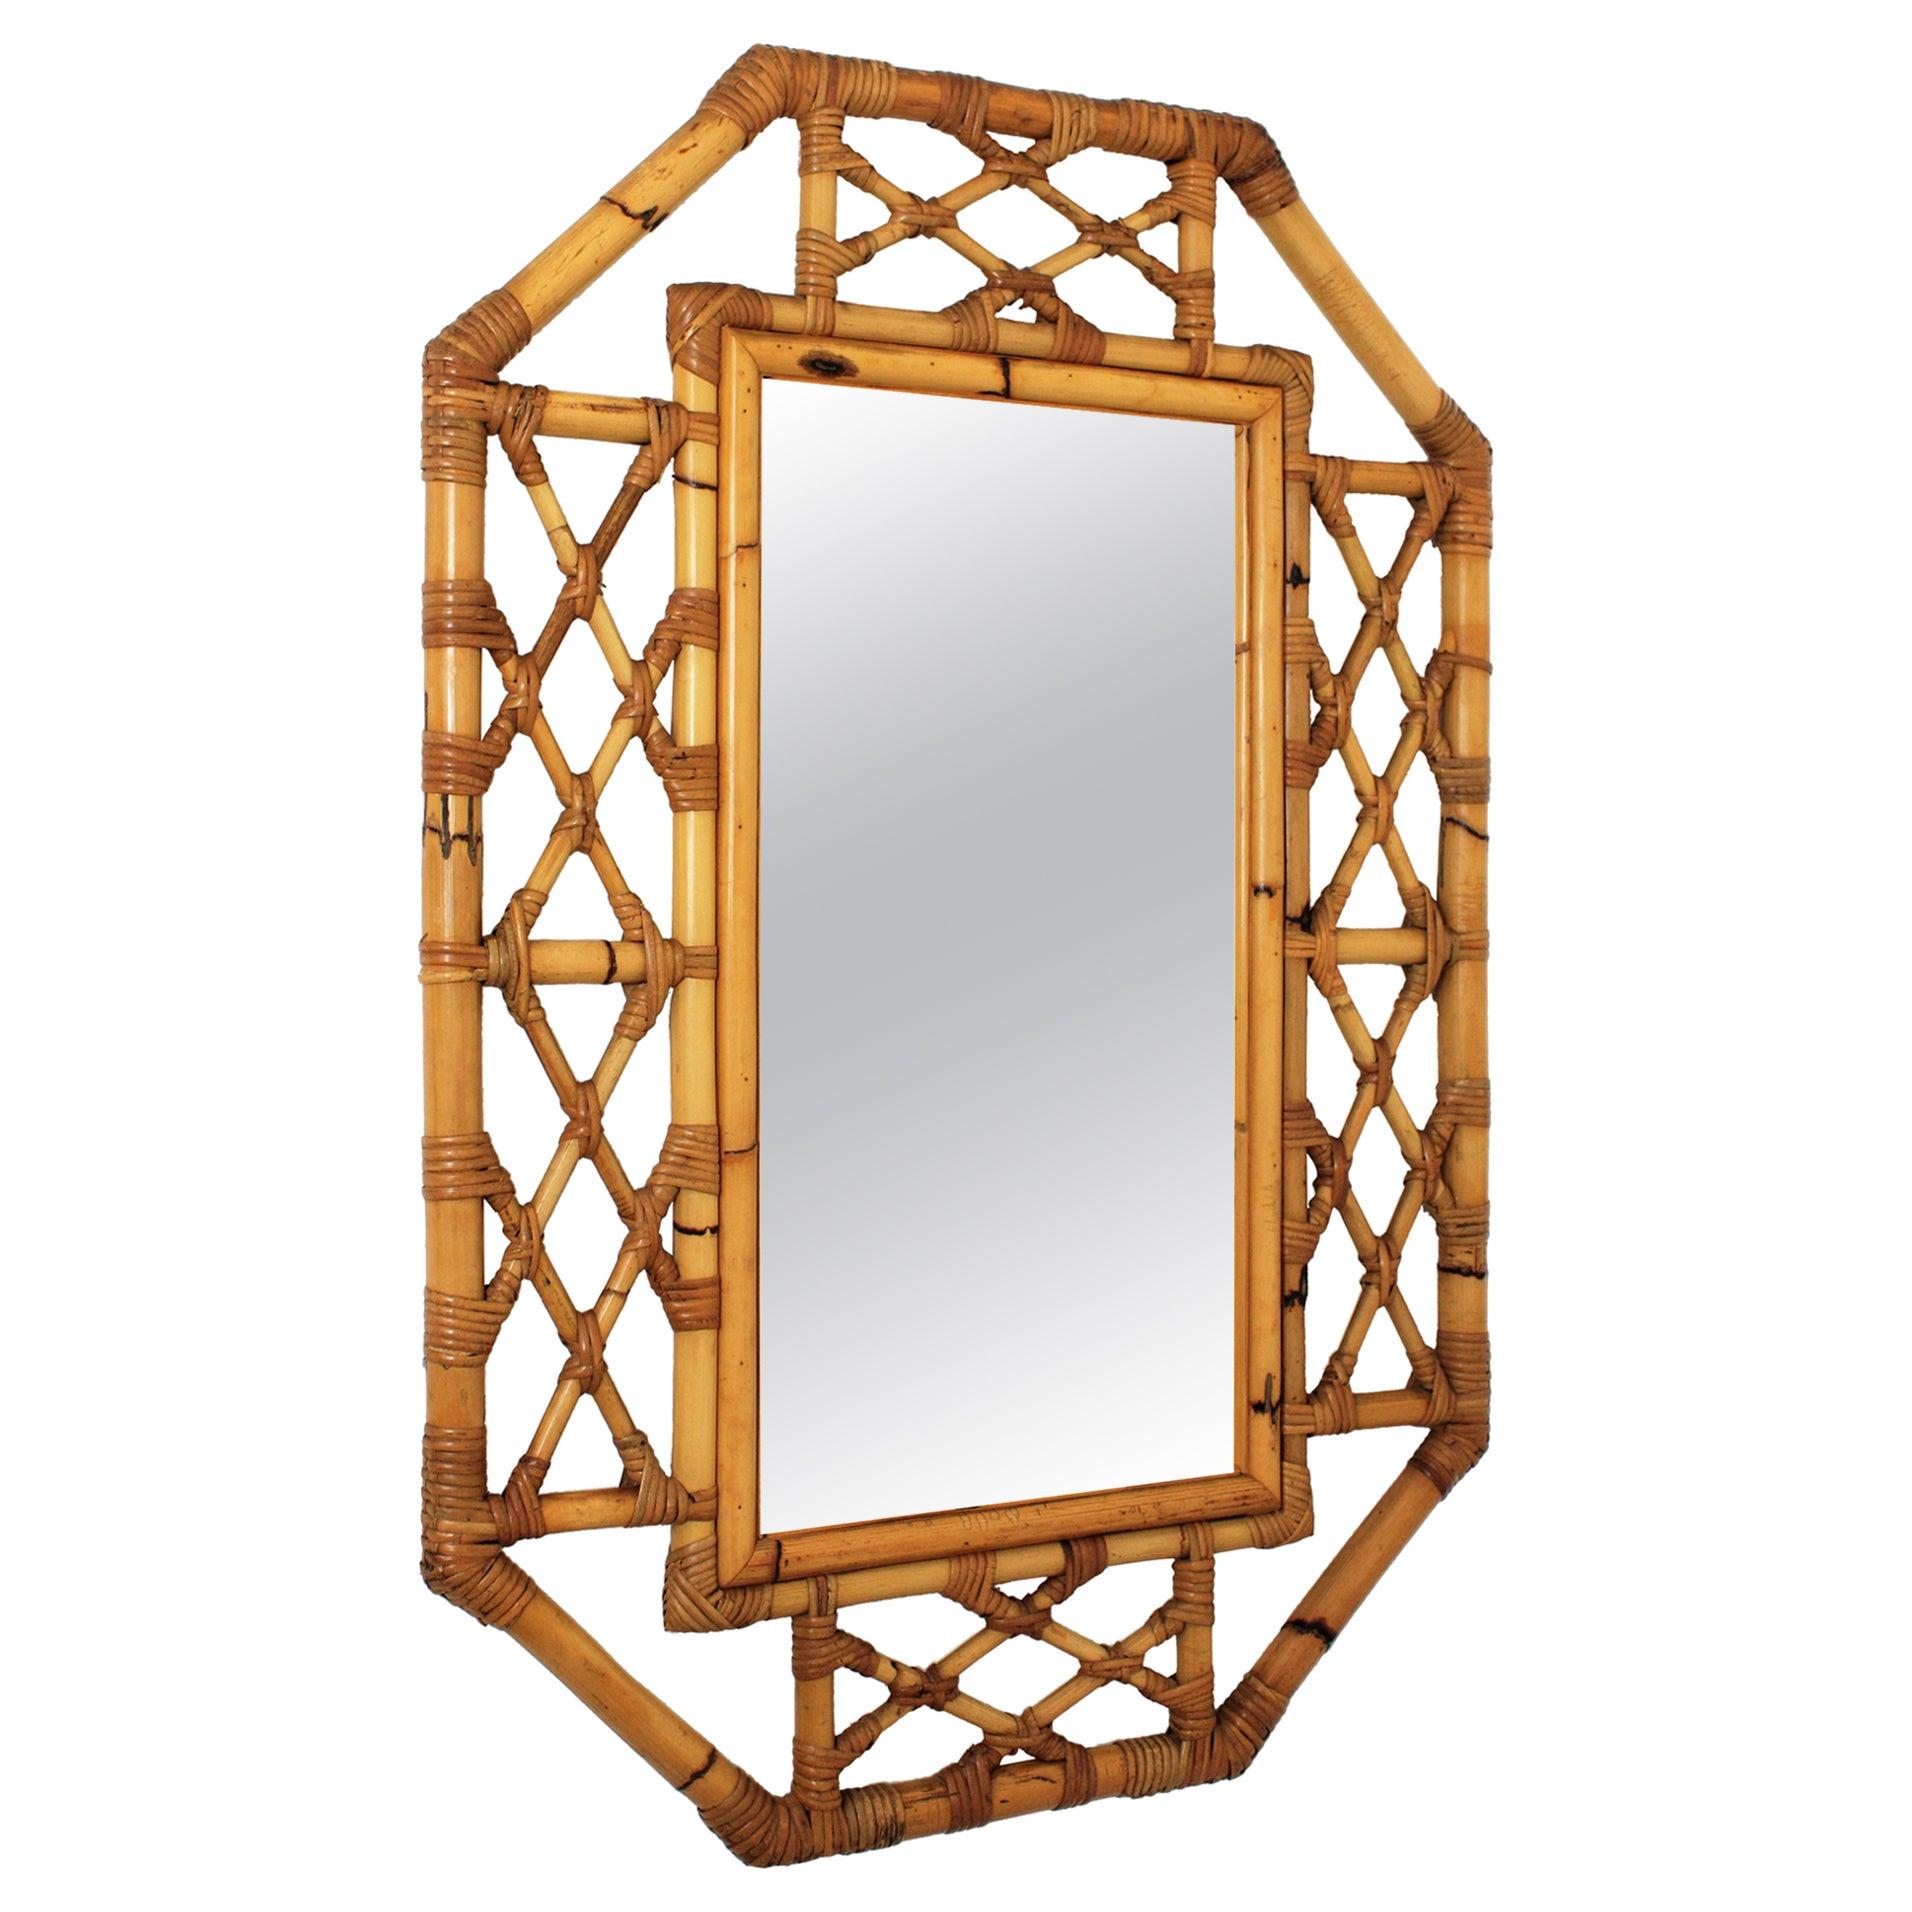 Mid-Century Modern Bamboo Mirror, Chinoiserie Tiki Style, Spain, 1960s